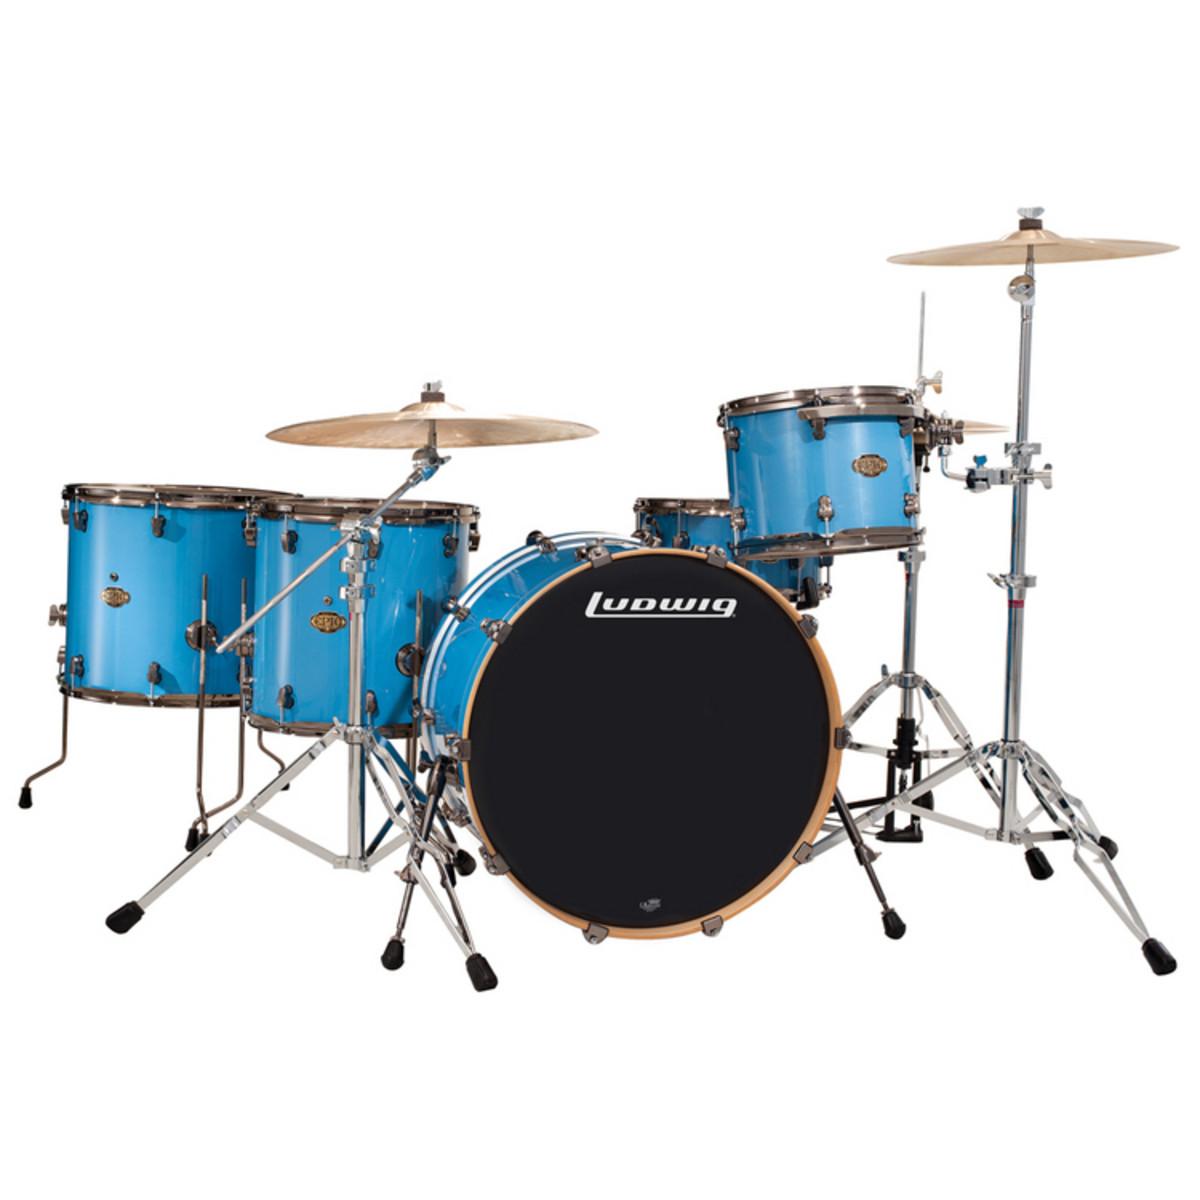 disc ludwig epic funk acoustic drum kit celestial blue at. Black Bedroom Furniture Sets. Home Design Ideas